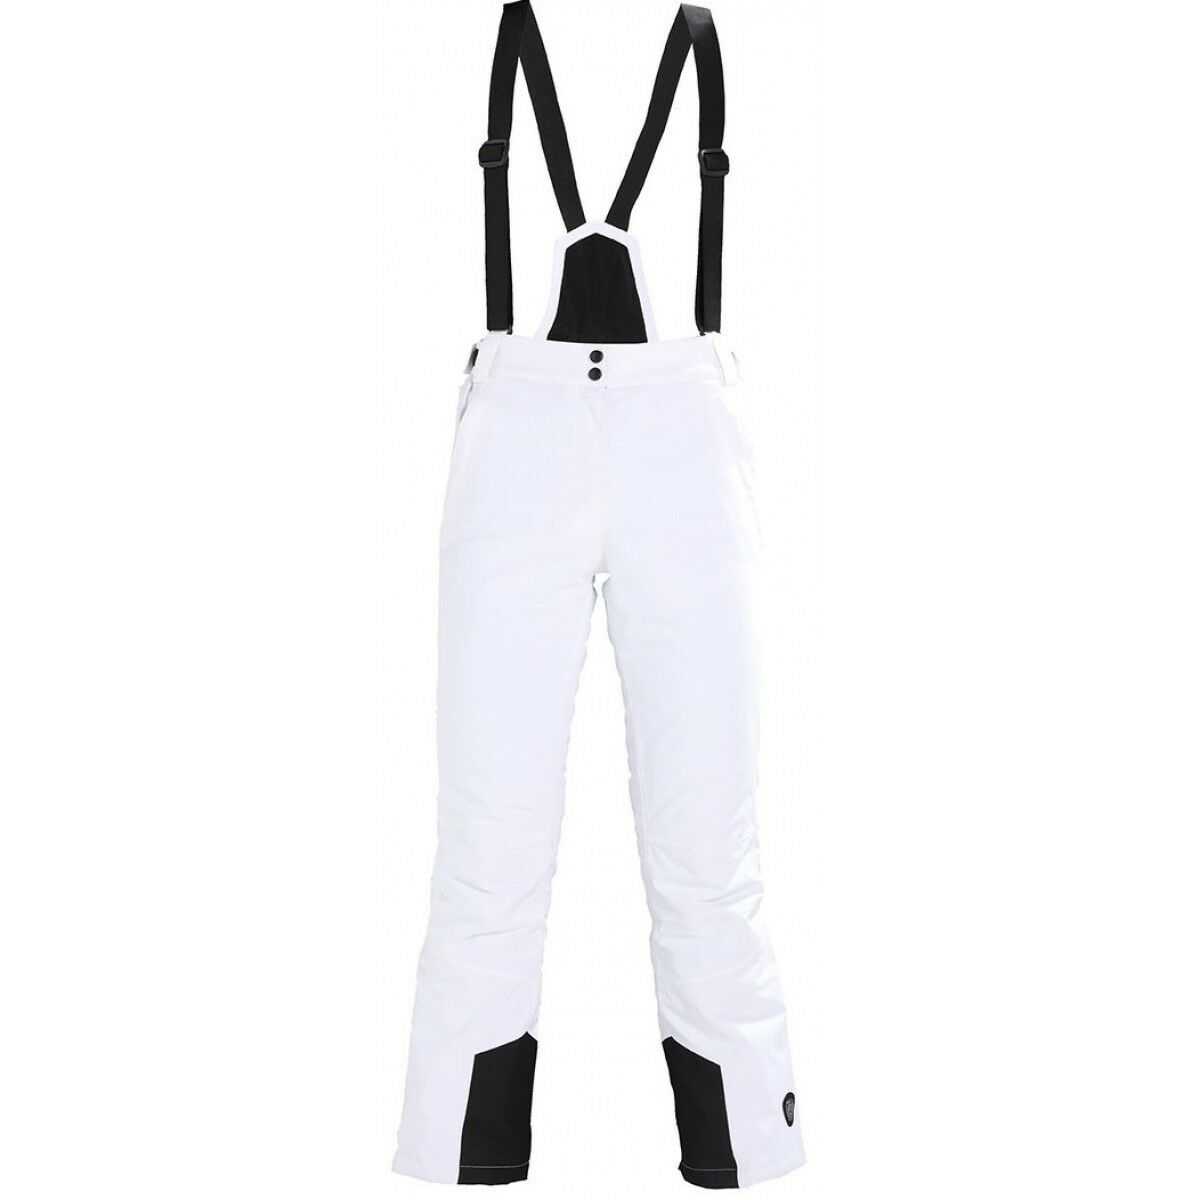 Women's KILLTEC Erielle Insulated Ski  Pants WHITE Detachable Bib w  Suspenders  simple and generous design